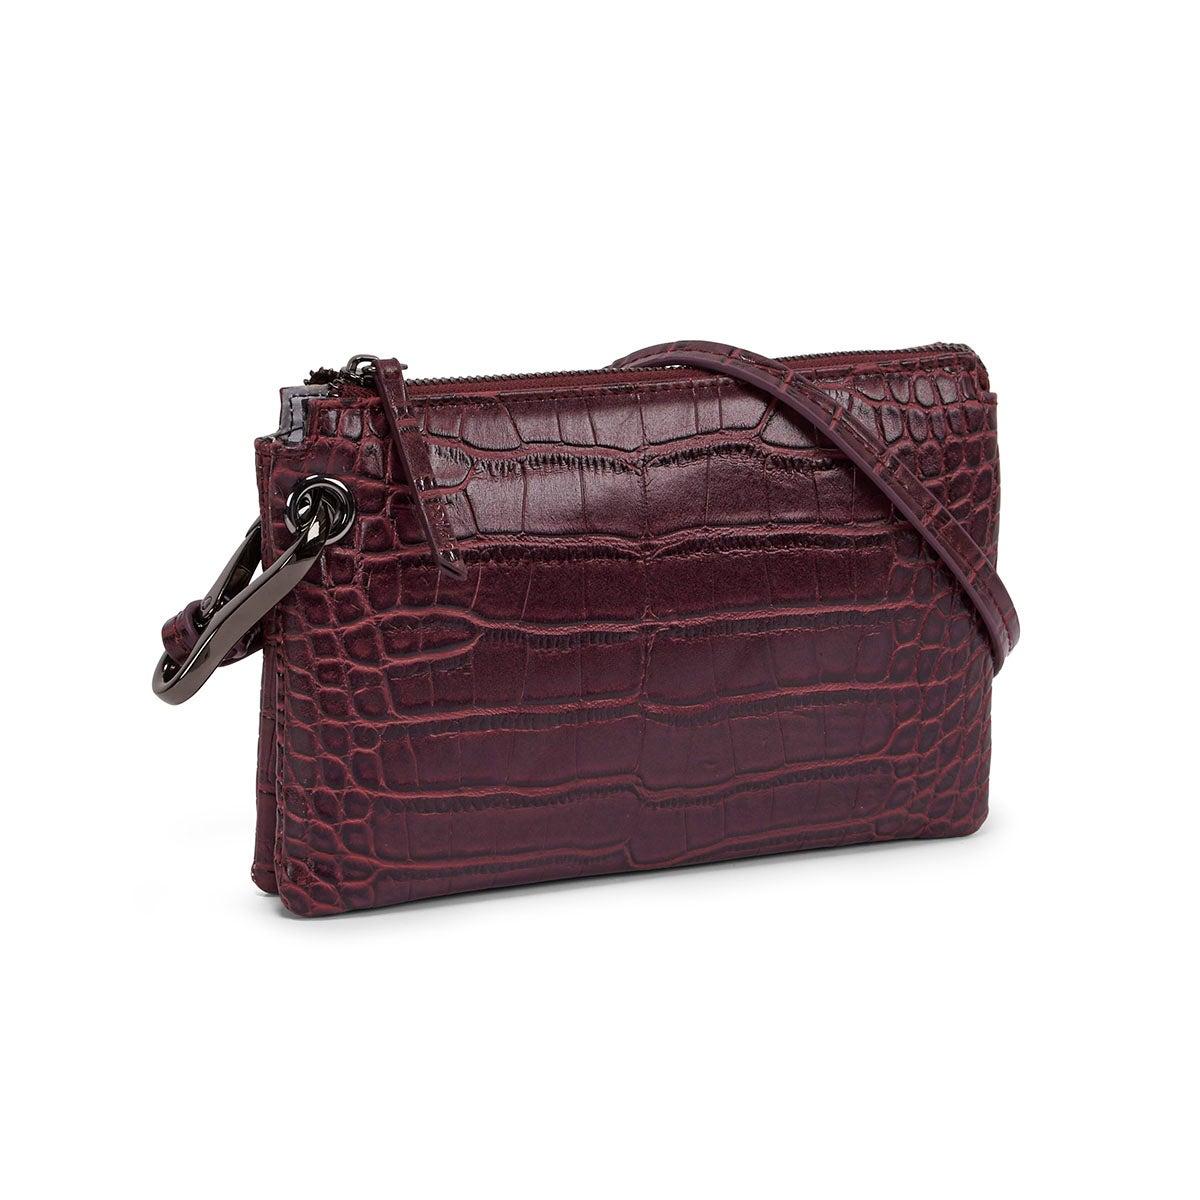 Women's 5380 wine mini cross body bag